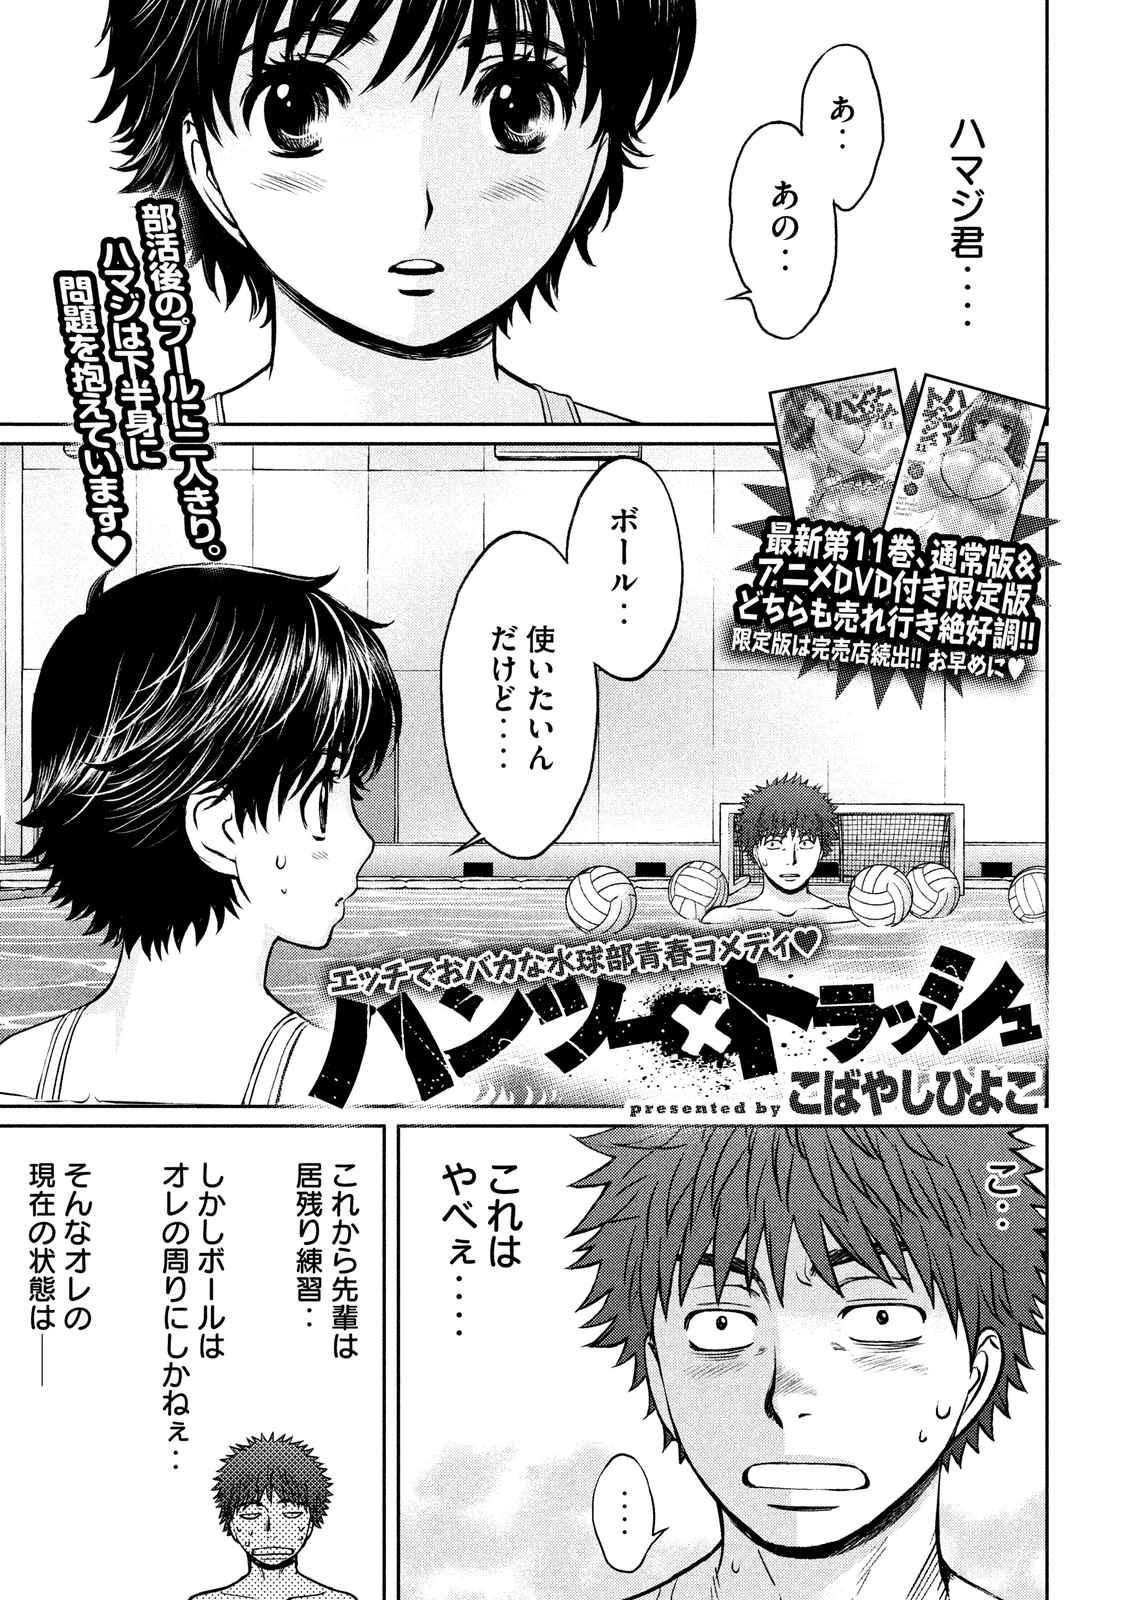 Hantsu_x_Trash Chapter 136 Page 1